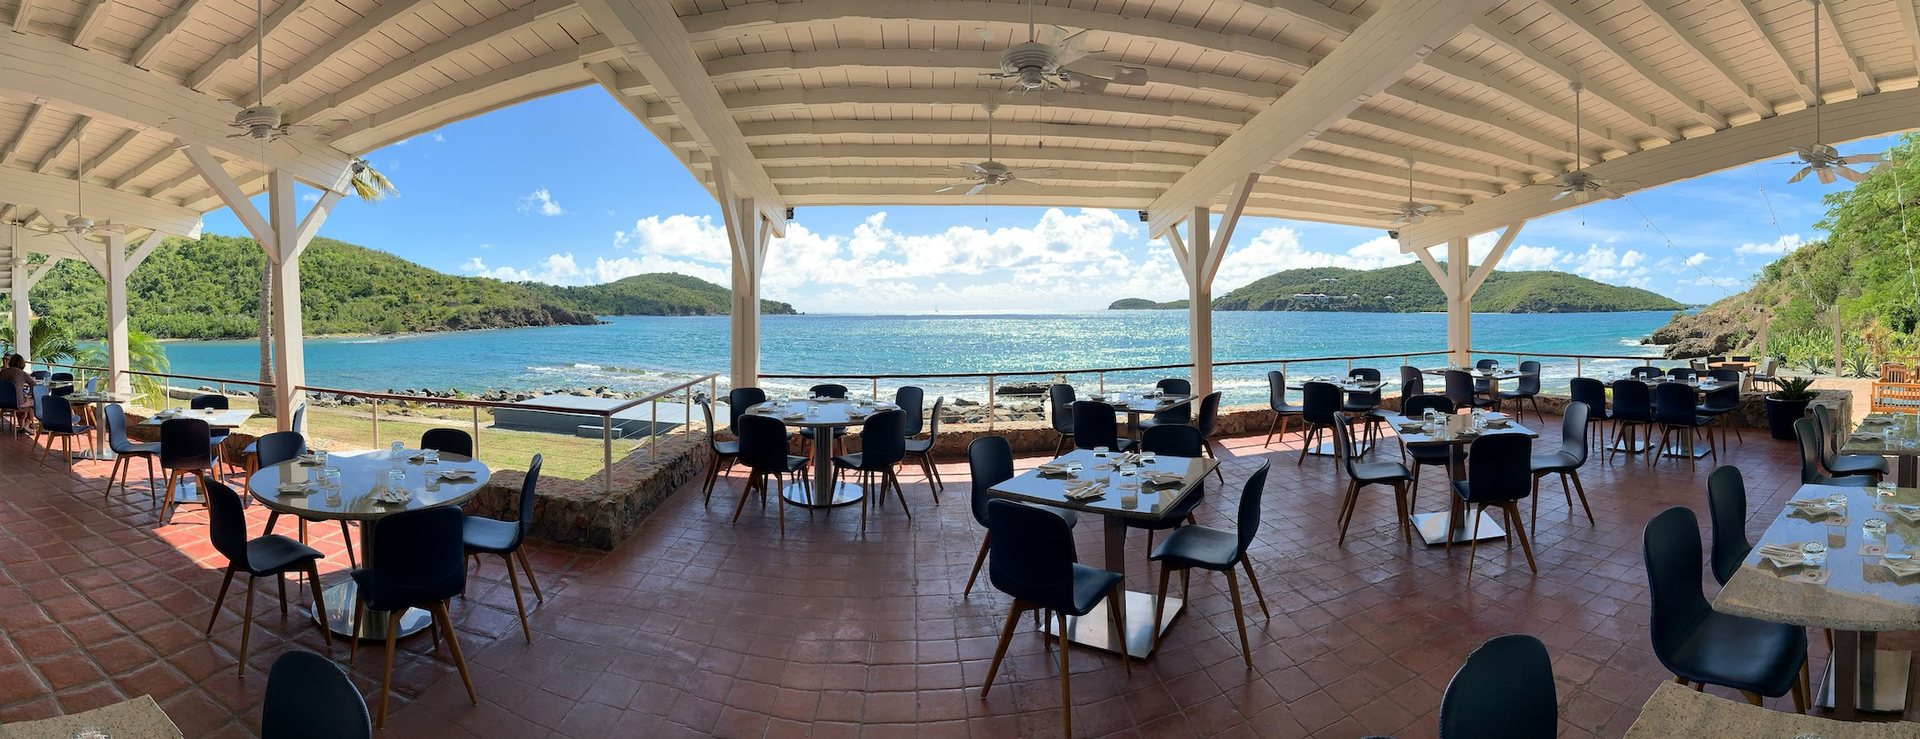 Oceana Restaurant and Bistro Image 1